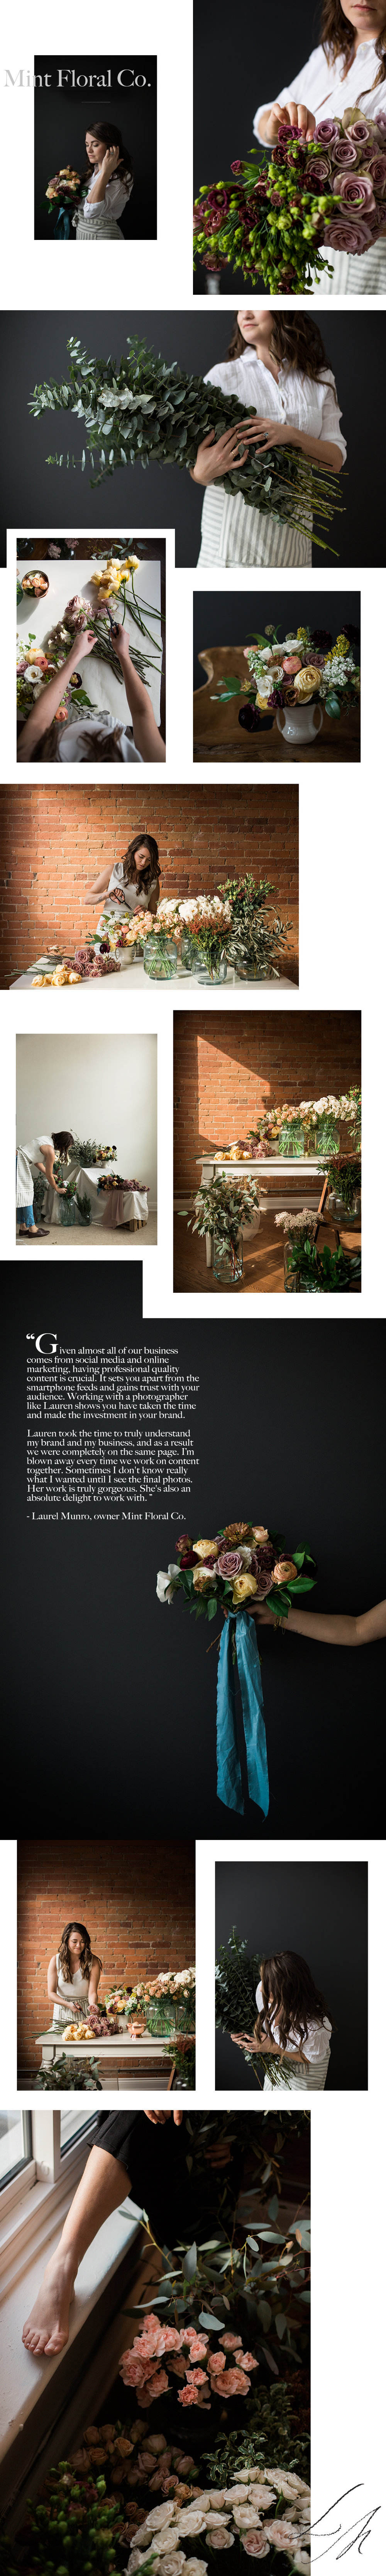 LaurenMiller_Photographer_Lifestyle_Branding_Toronto_MintFloralCo.jpg